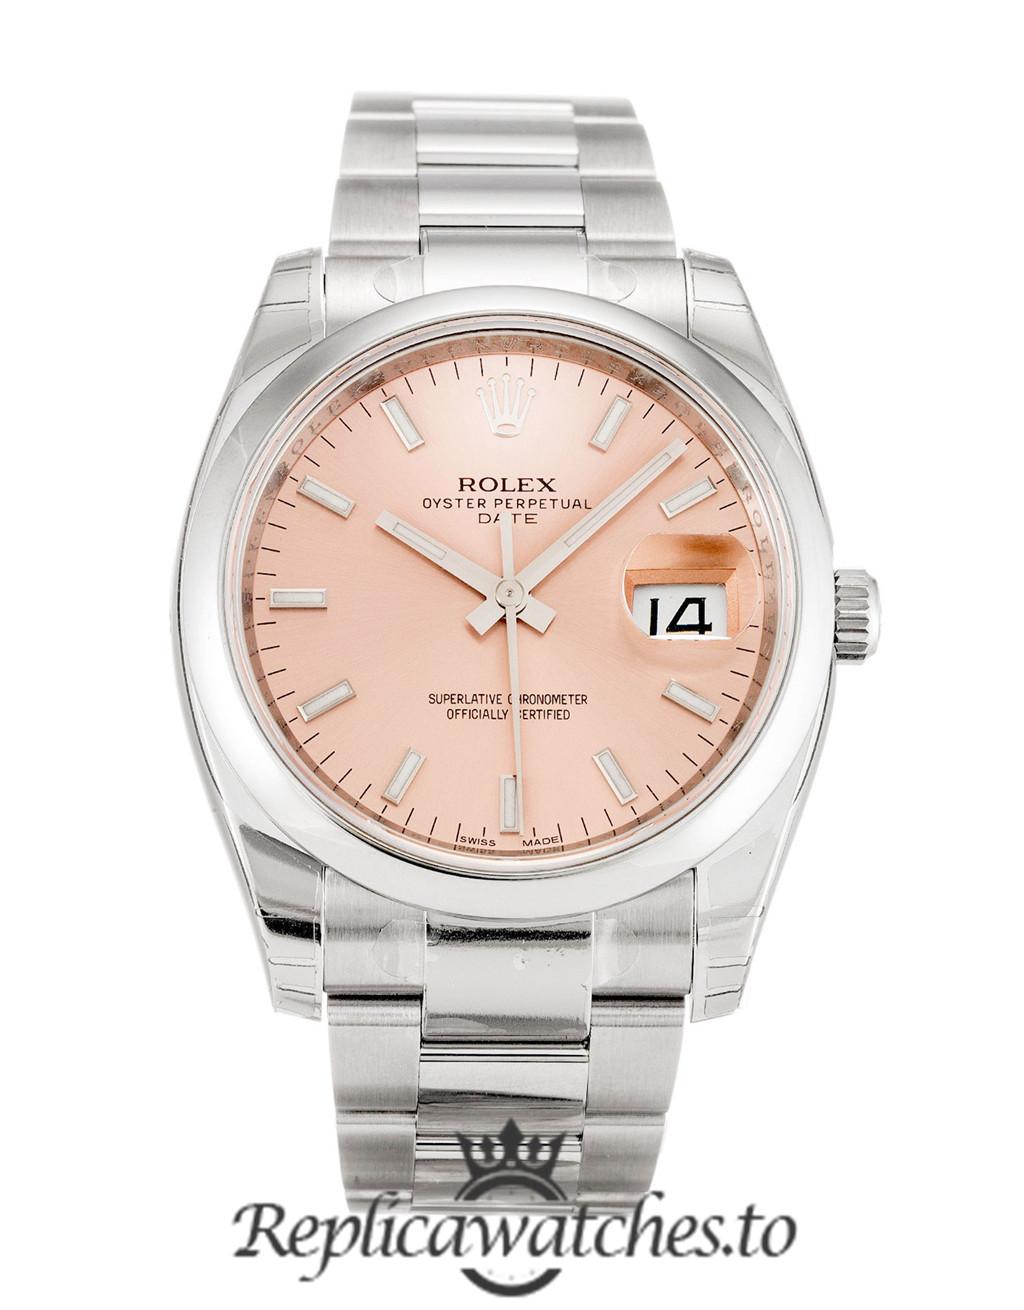 Rolex Oyster Perpetual Replica 115200 Silver Strap 34MM